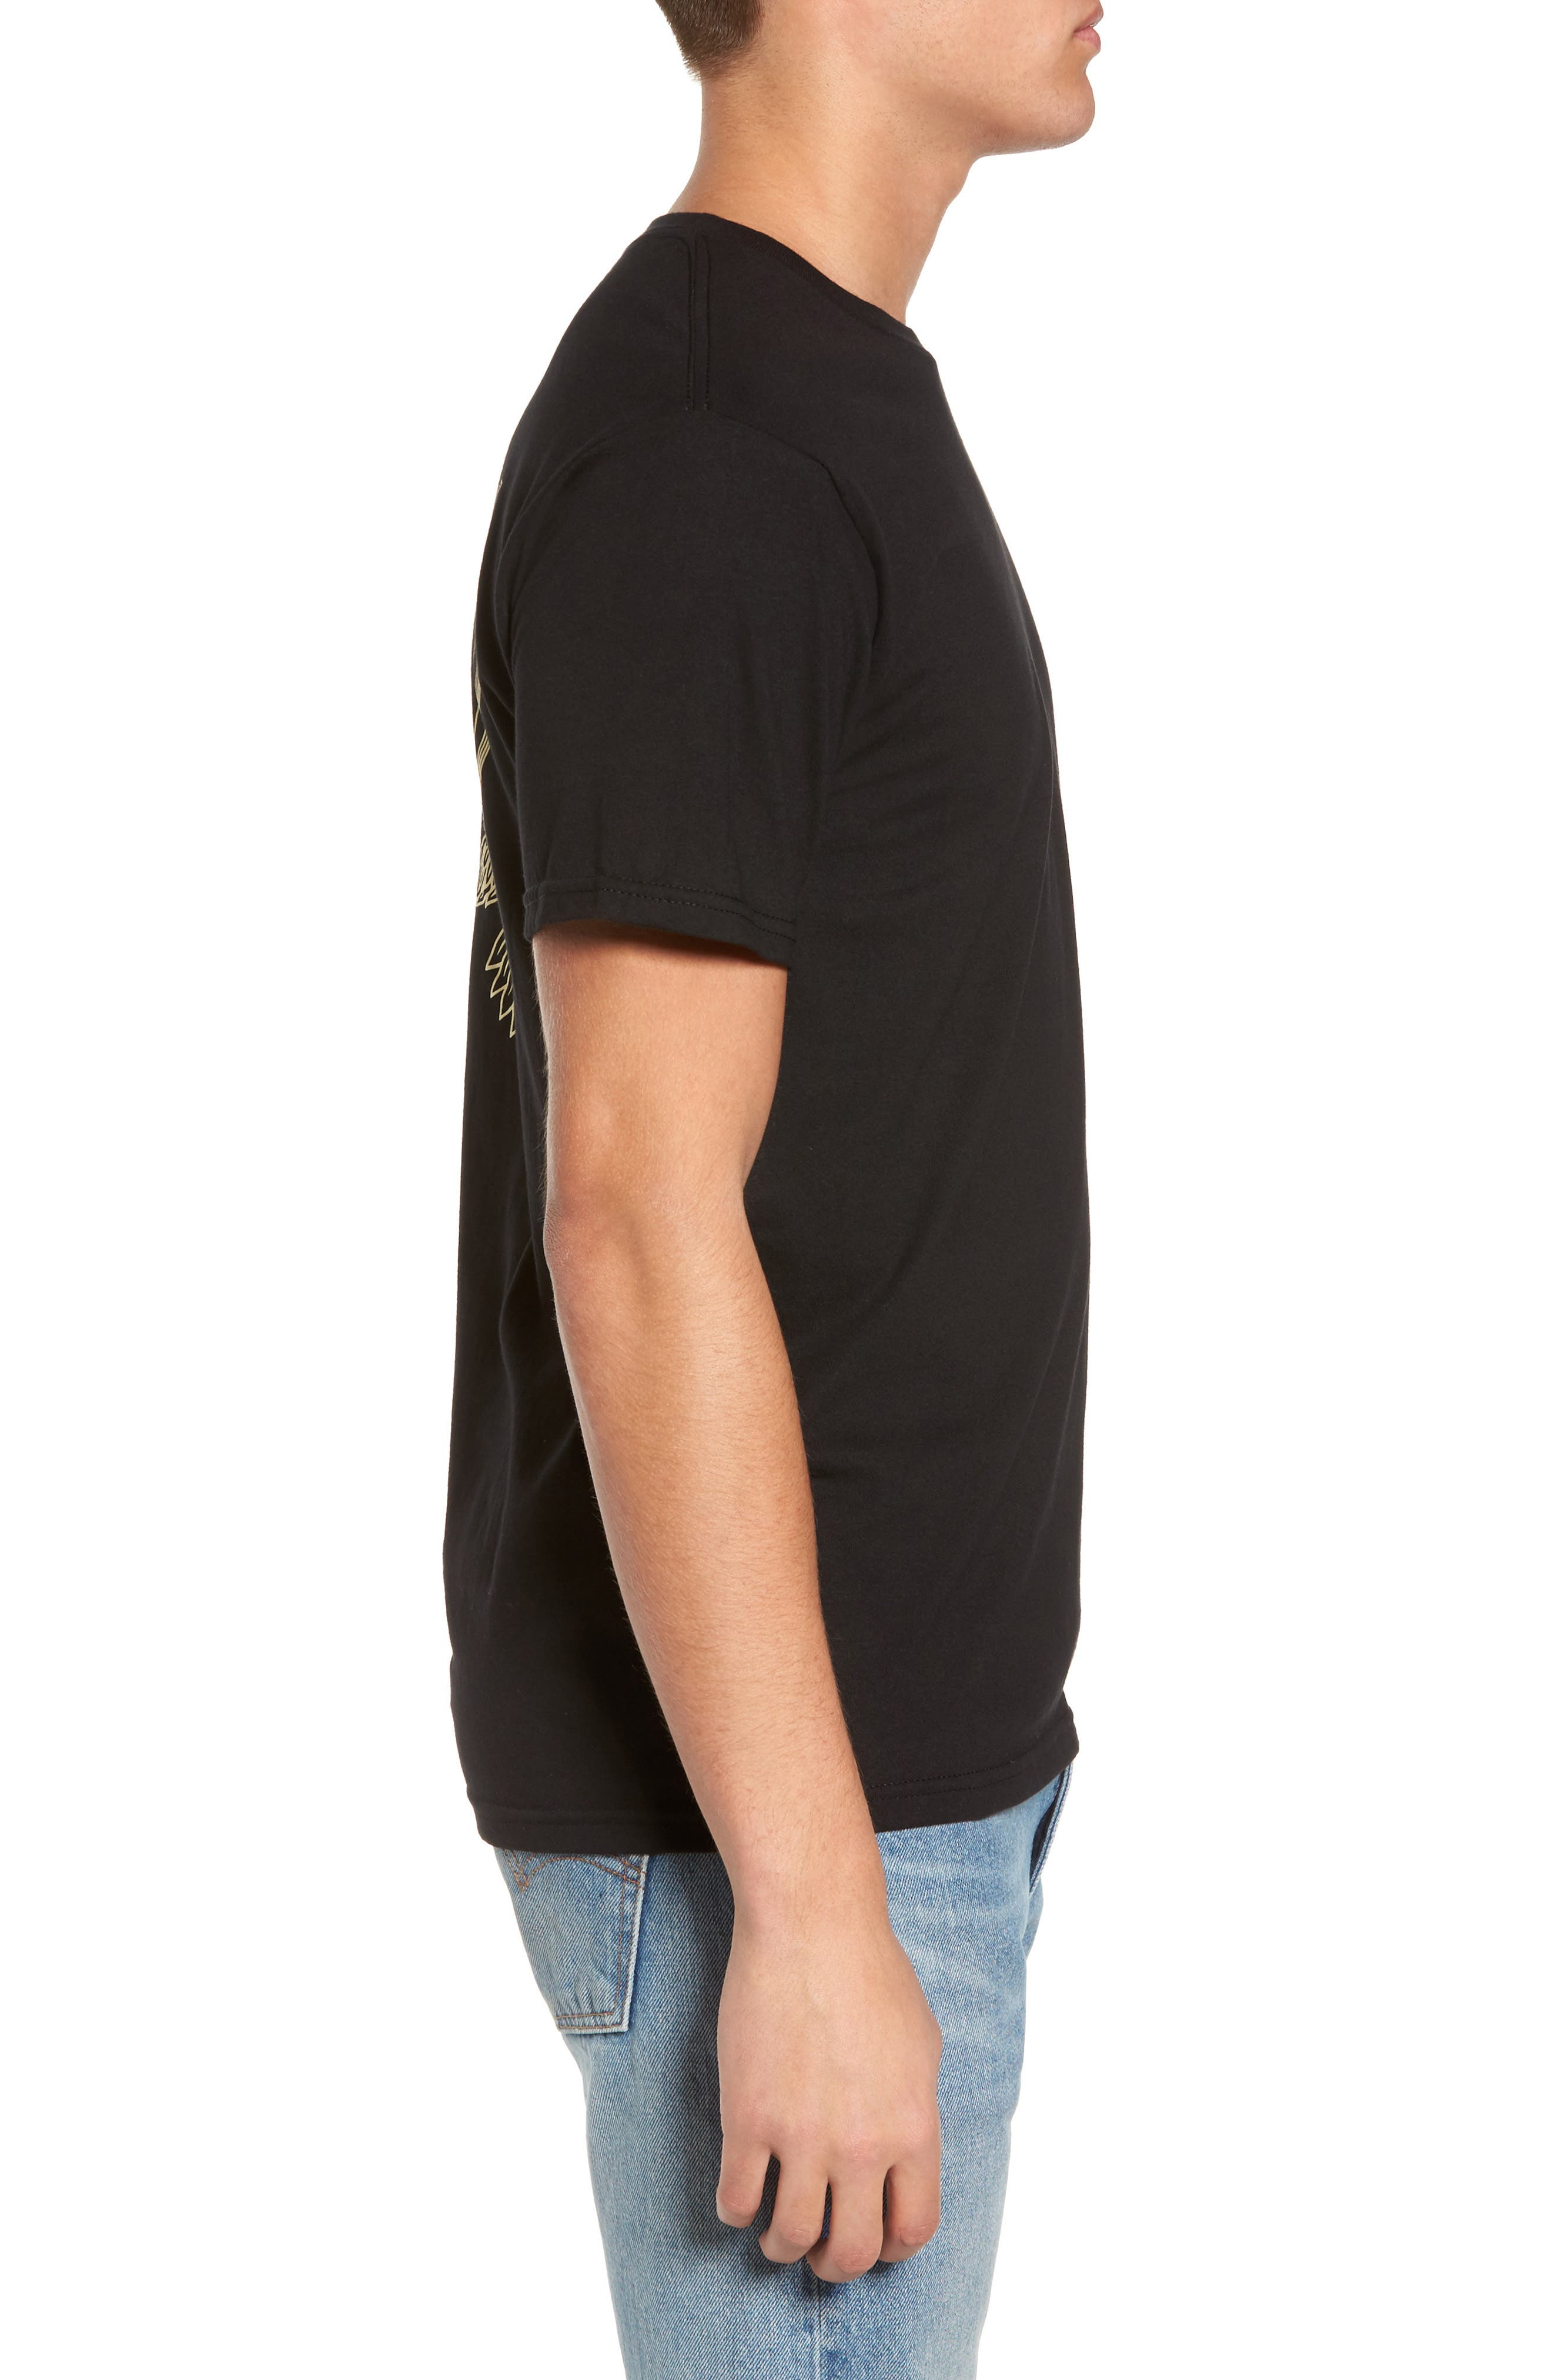 Look Out Below Premium Graphic T-Shirt,                             Alternate thumbnail 3, color,                             Black